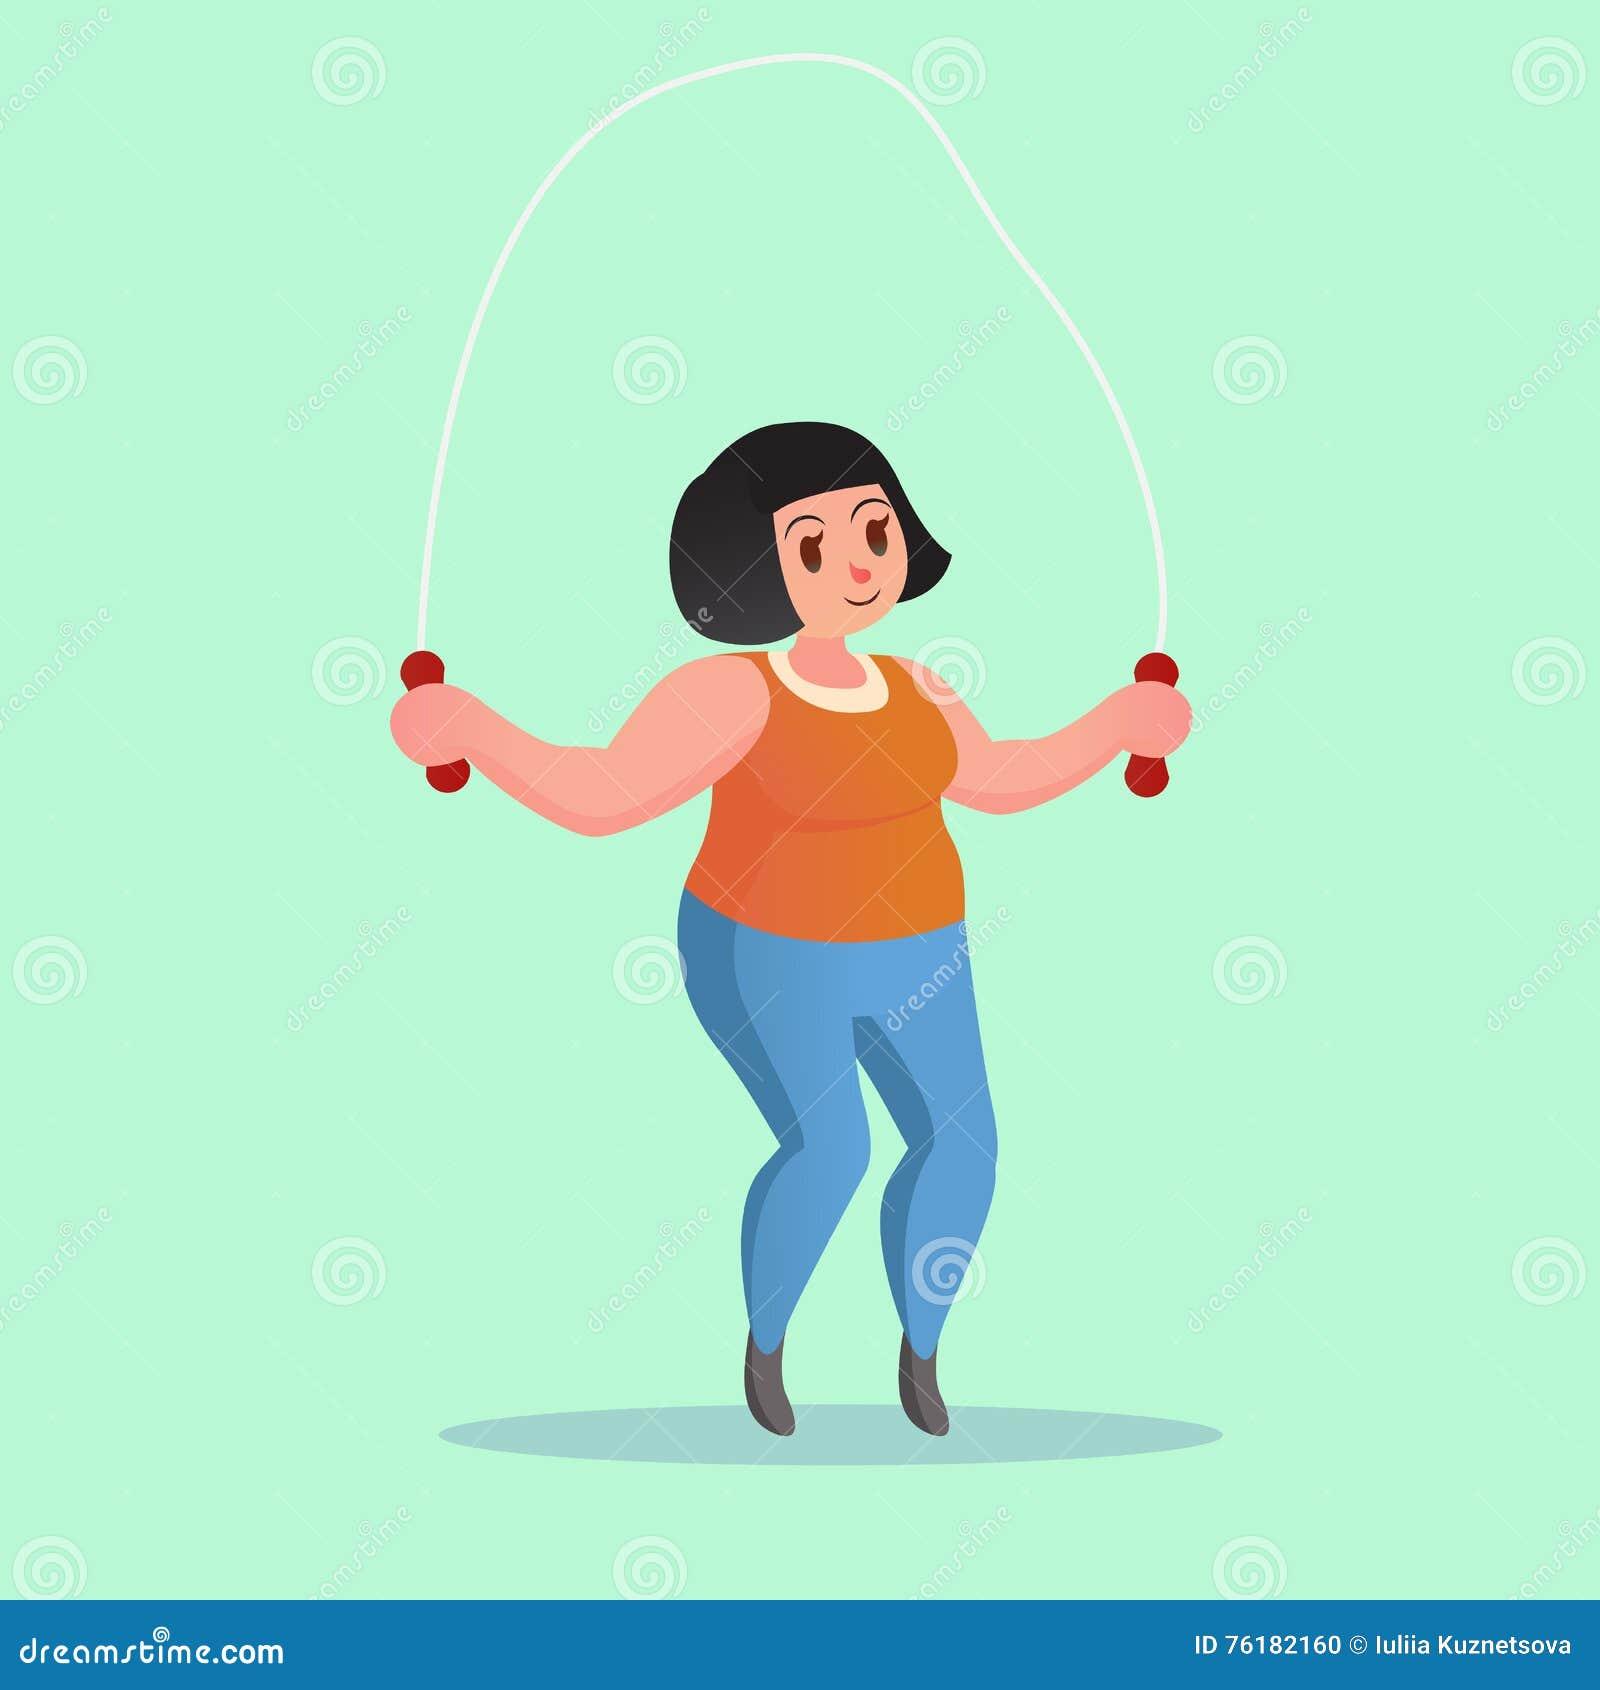 Obese Young Woman Jump Rope Workout Funny Cartoon Illustration Stock on woman jump, huge jump, group jump, funny jump, beach jump, cheerleader jump, fun jump, car jump,